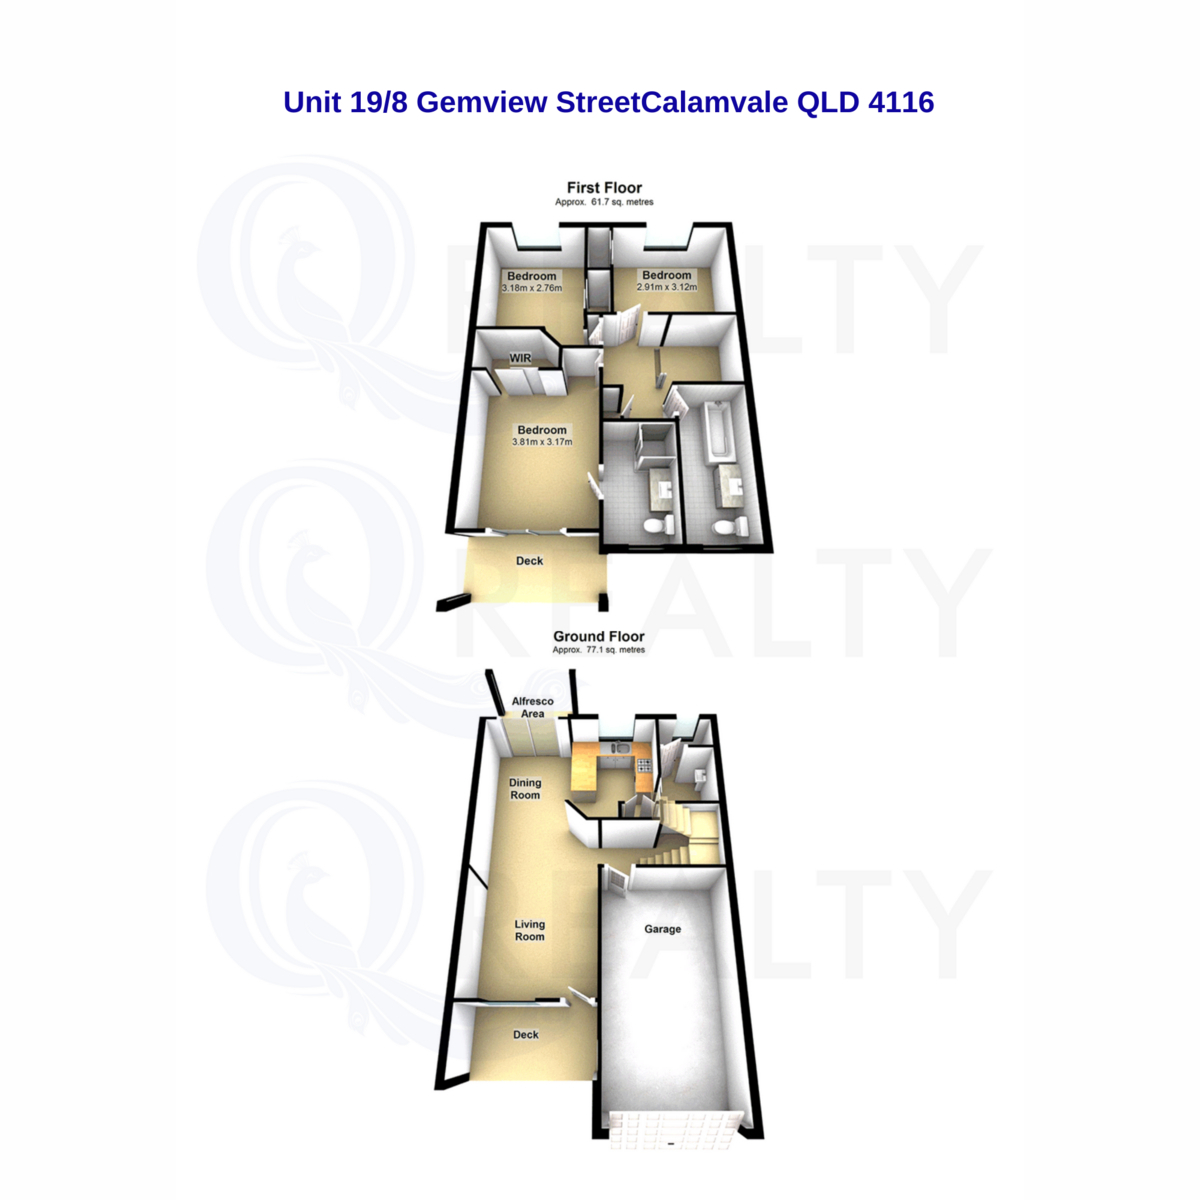 19.8 Gemview Street, Calamvale  QLD  4116